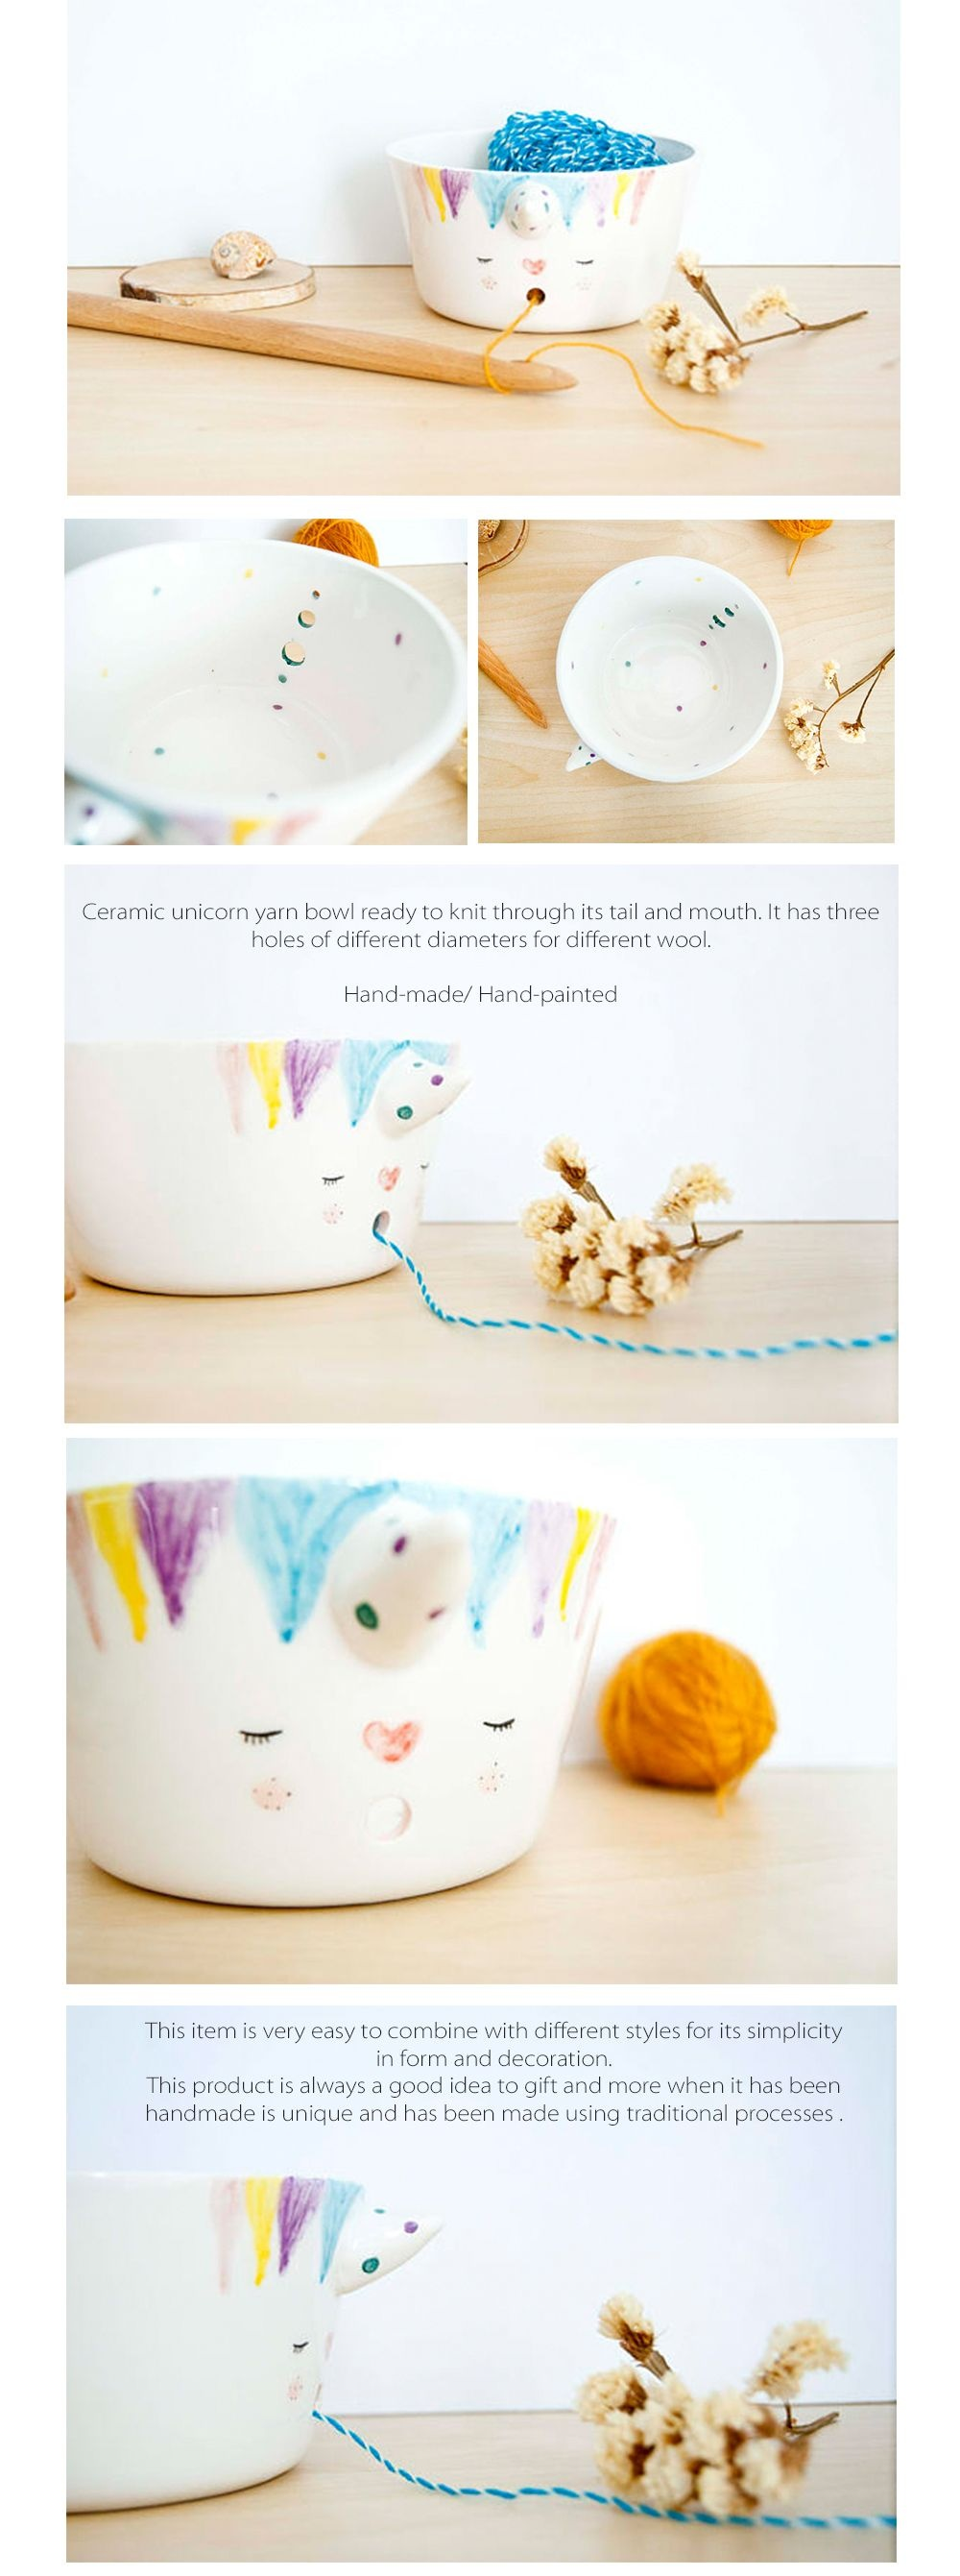 Unicorn Knitting Bowl Hand Painted Yarn Bowl